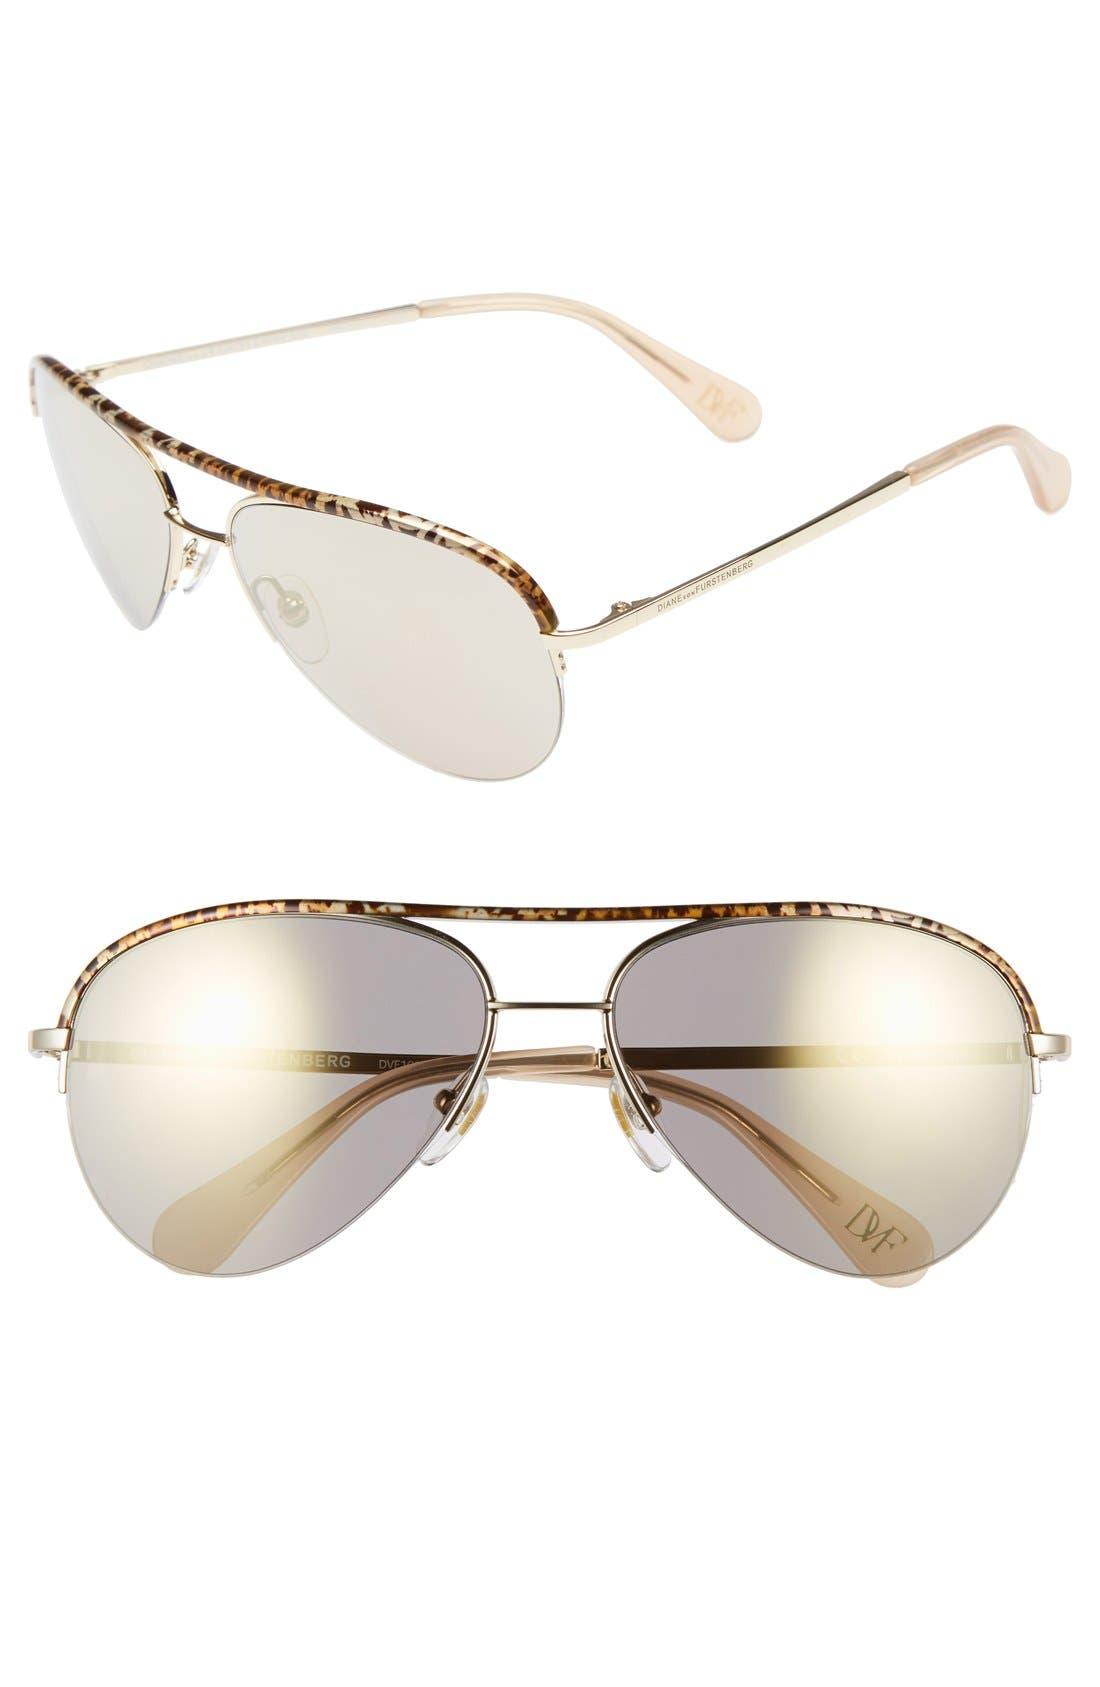 Main Image - Diane von Furstenberg 'Farrah' 58mm Aviator Sunglasses